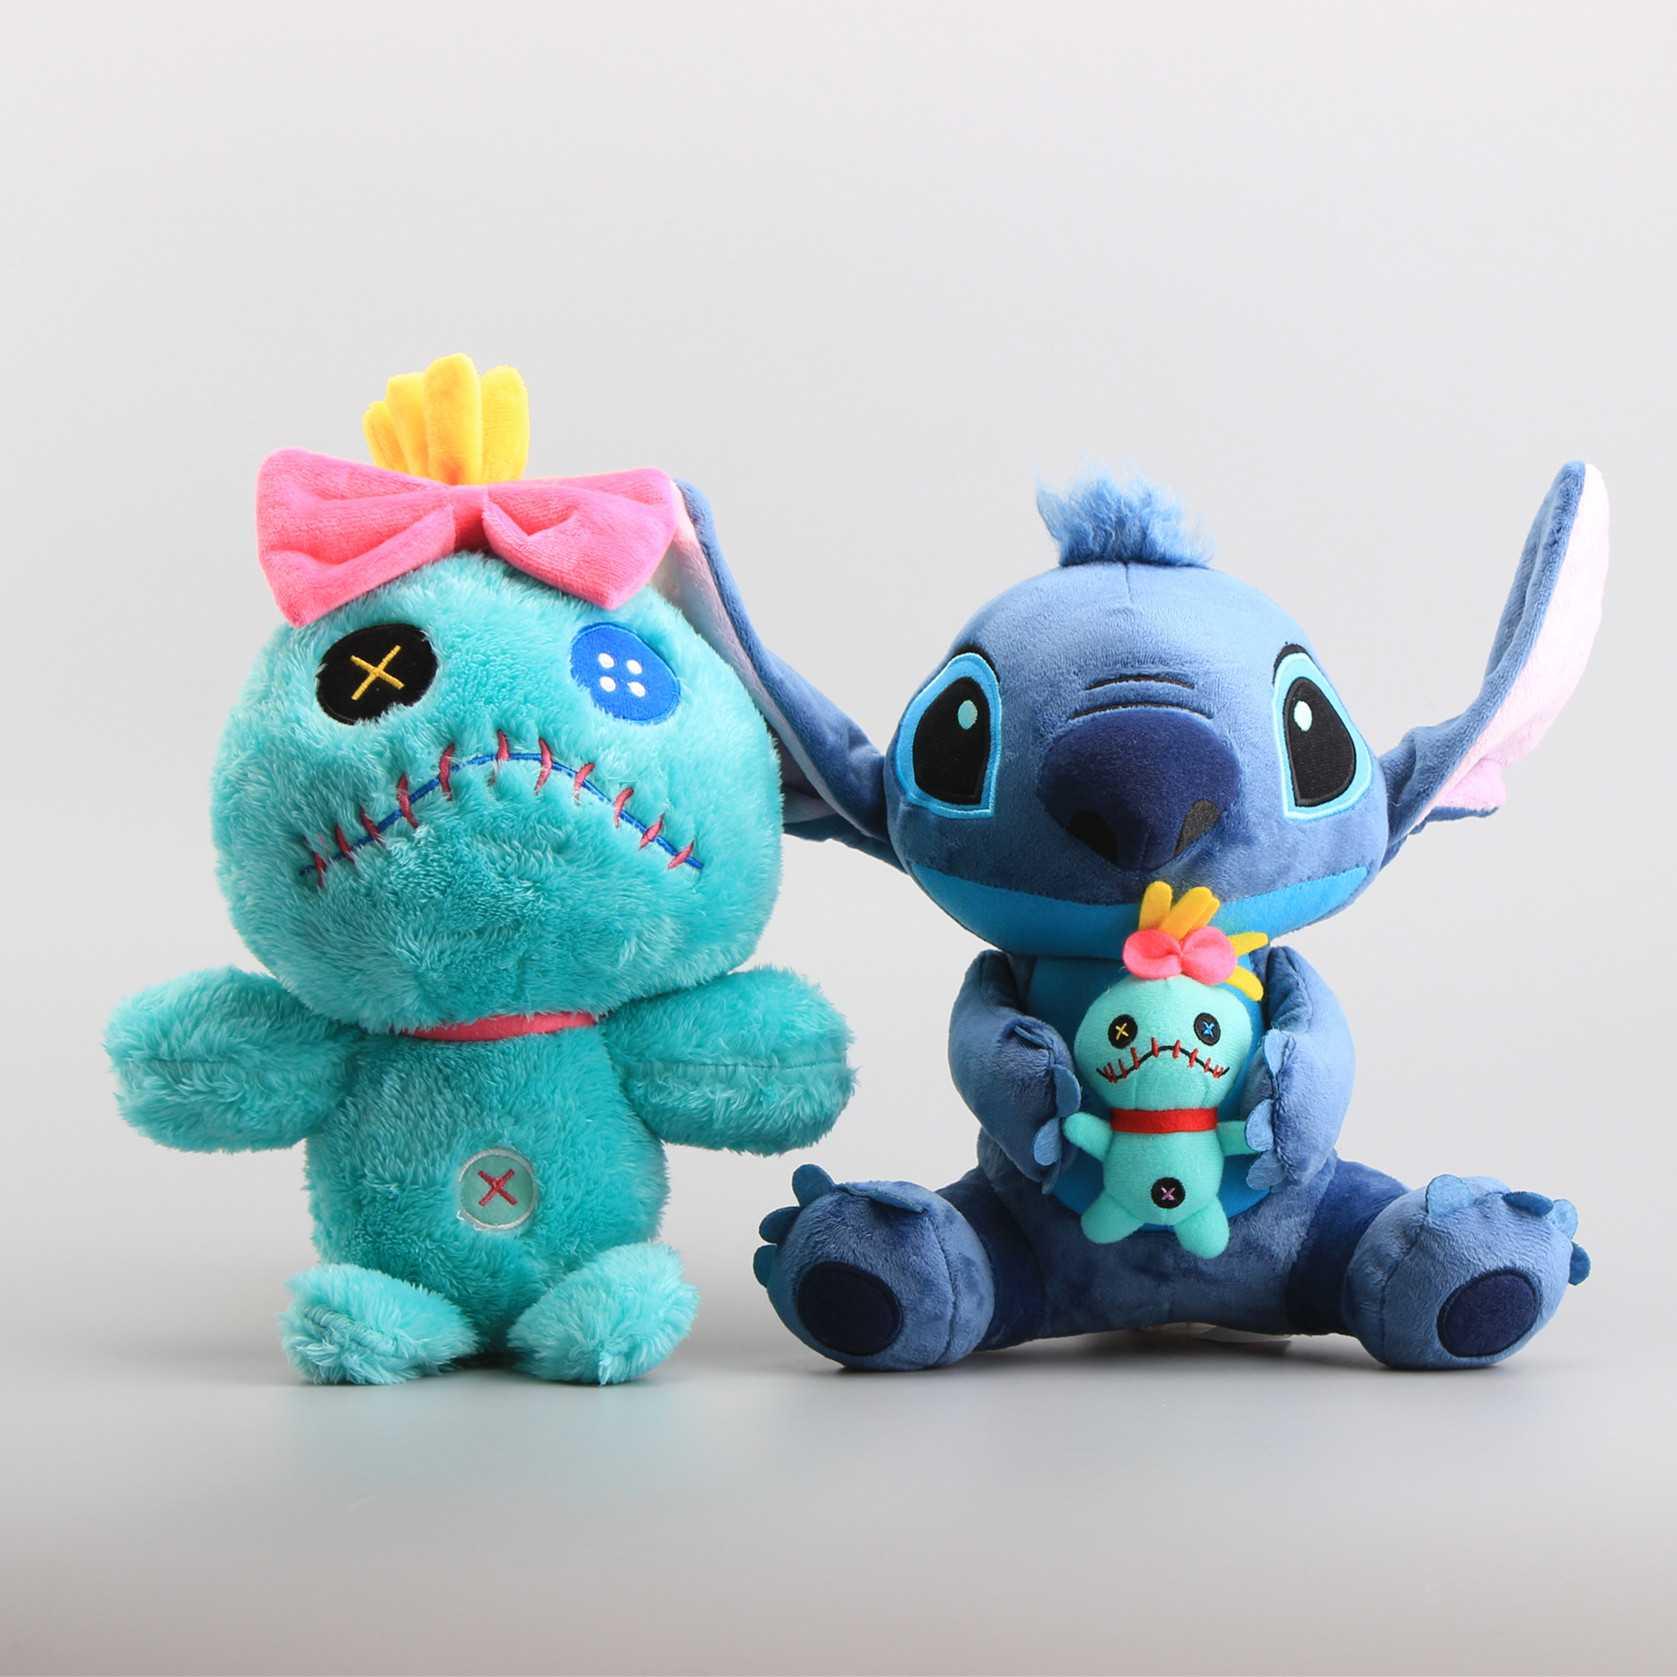 Cartoon Lilo Stitch Scrump Plush Doll Toys Cute Soft Stuffed Dolls Chilren Gift 25 32 Cm In Animals From Hobbies On